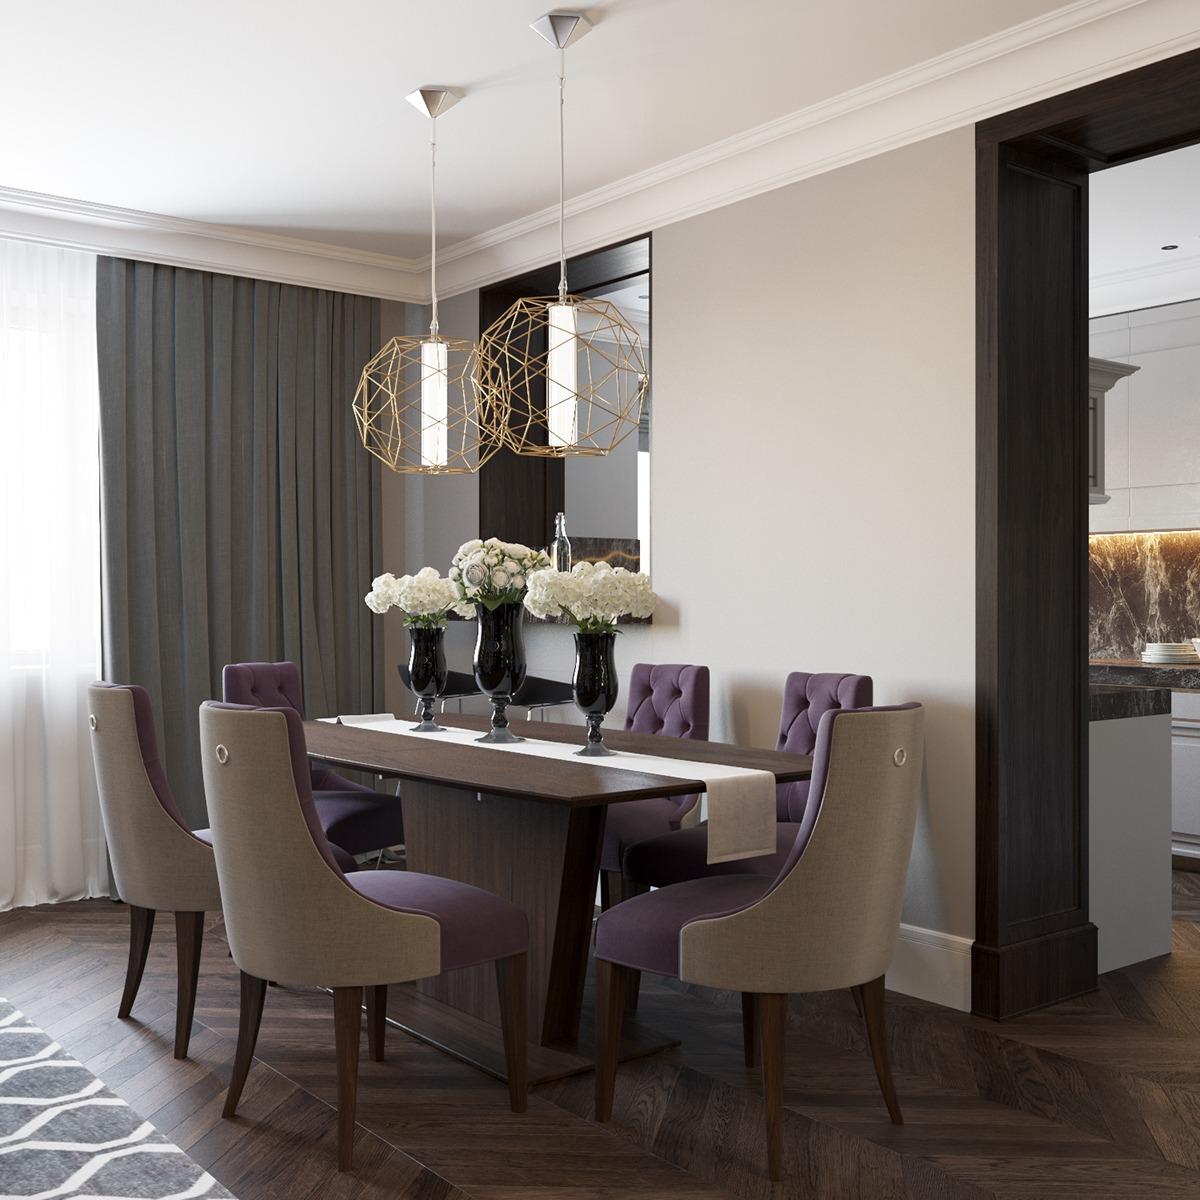 Art Deco Interior Designs And Furniture Ideas: 2 Beautiful Home Interiors In Art Deco Style